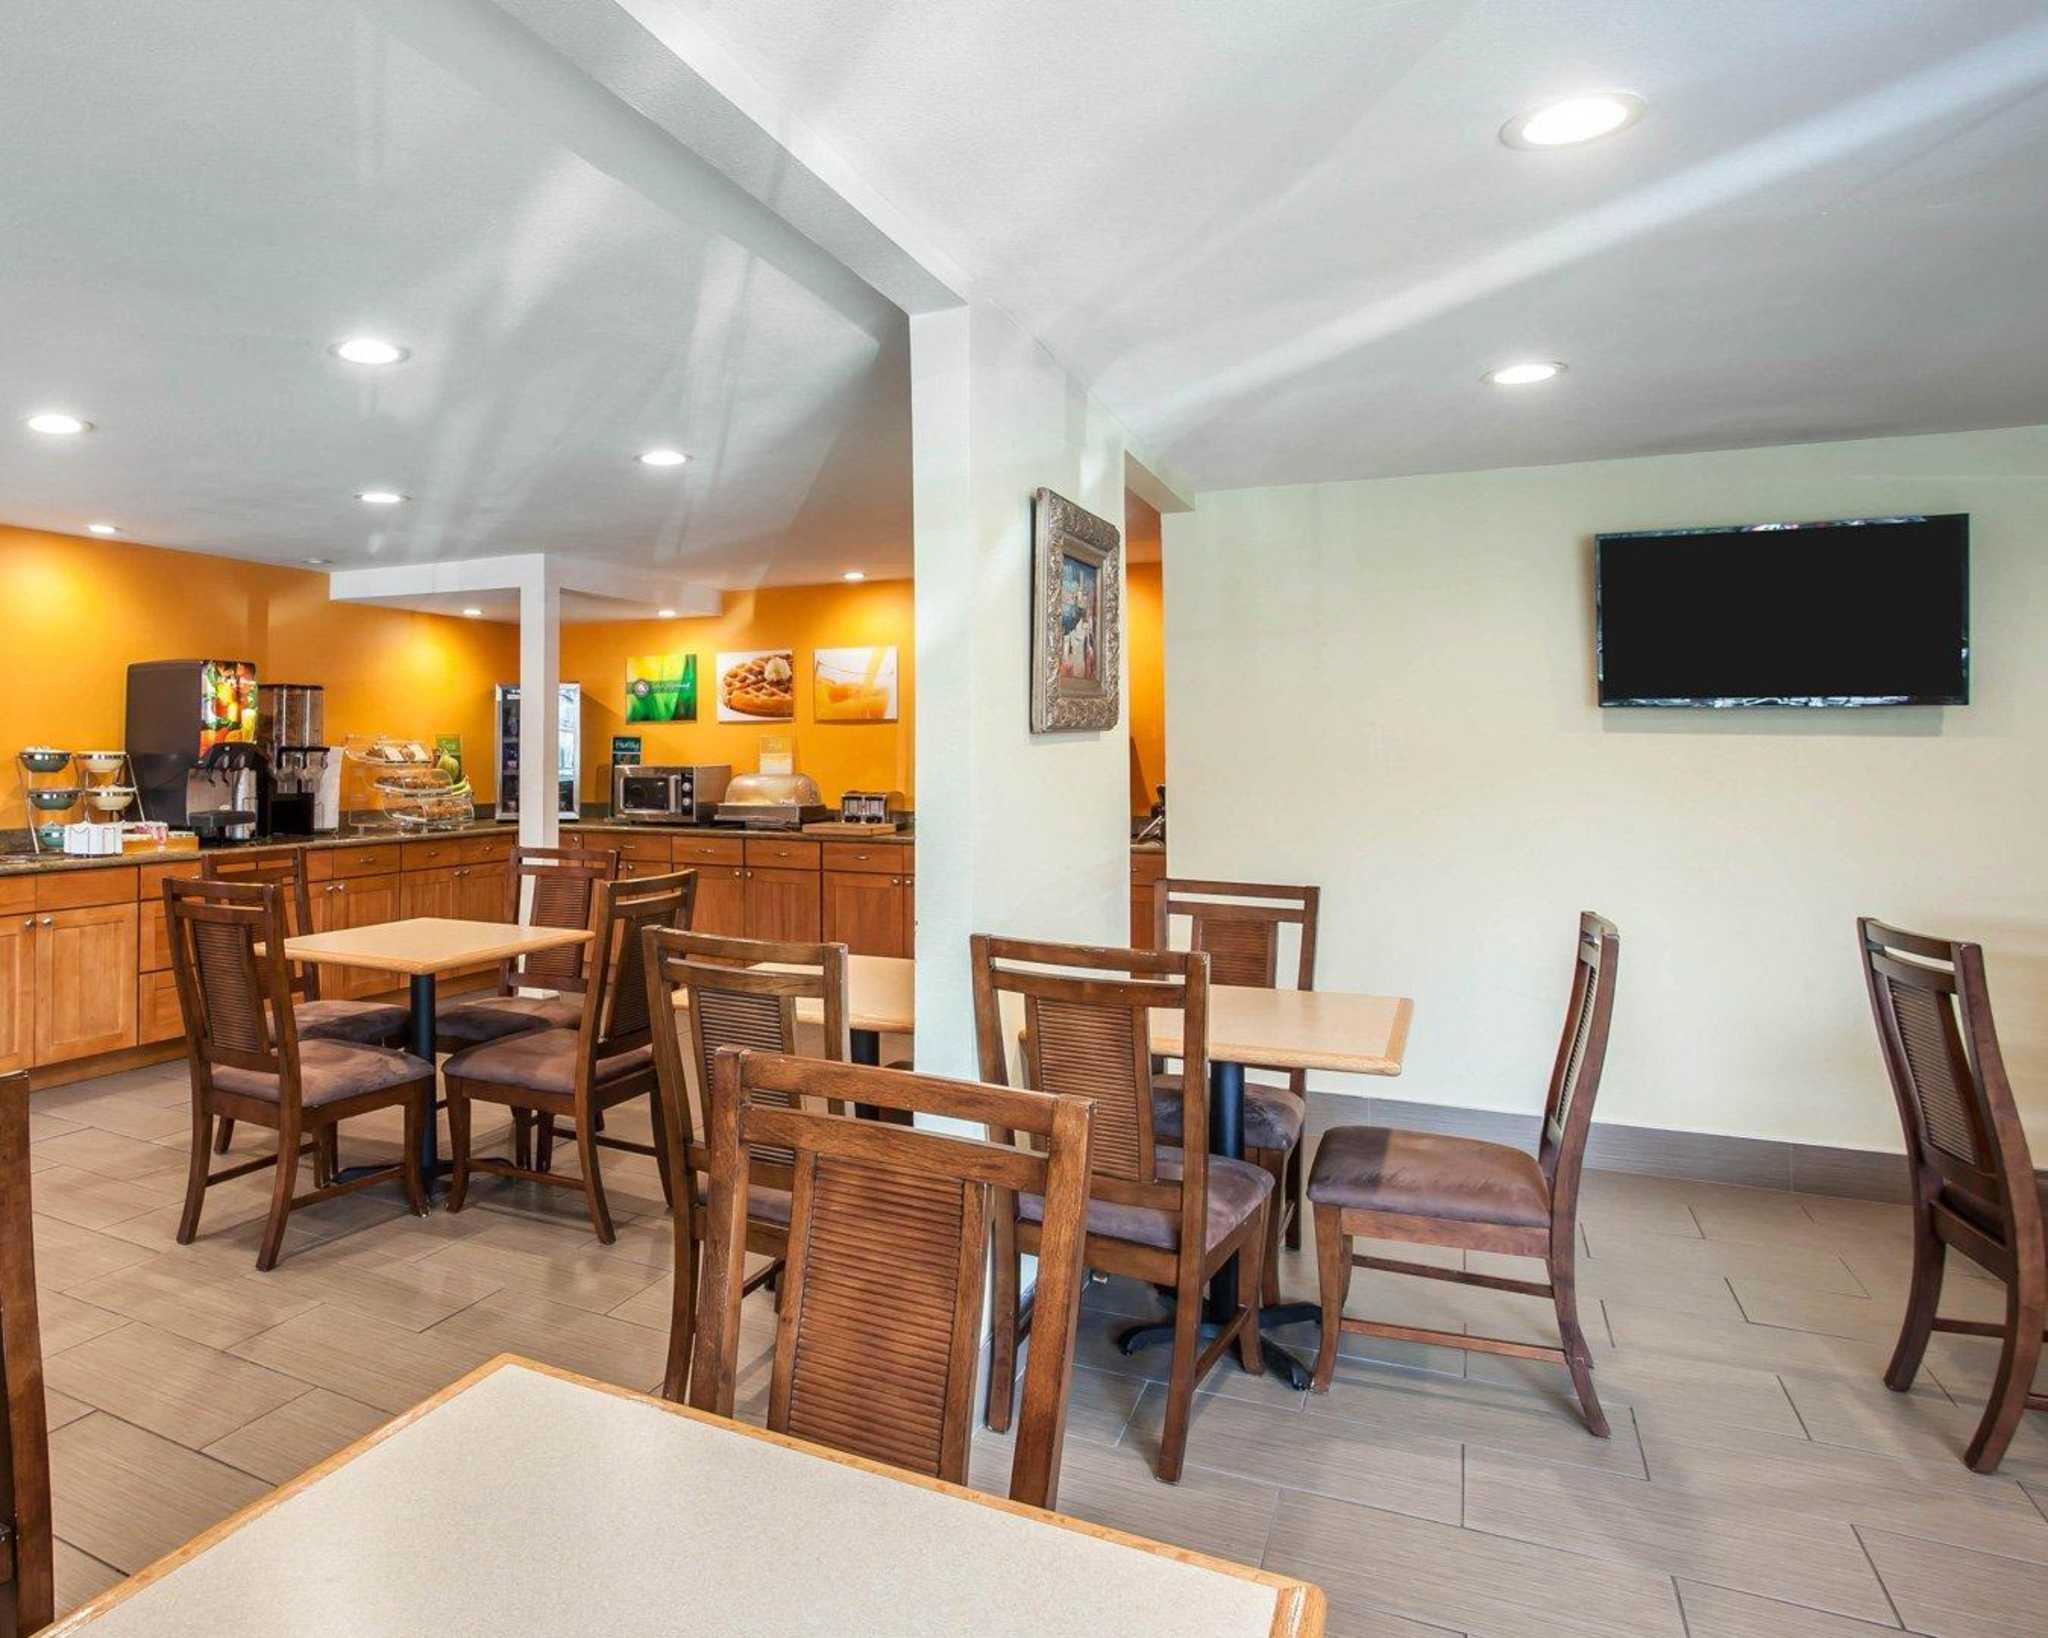 Quality Inn Sea-Tac Airport image 24